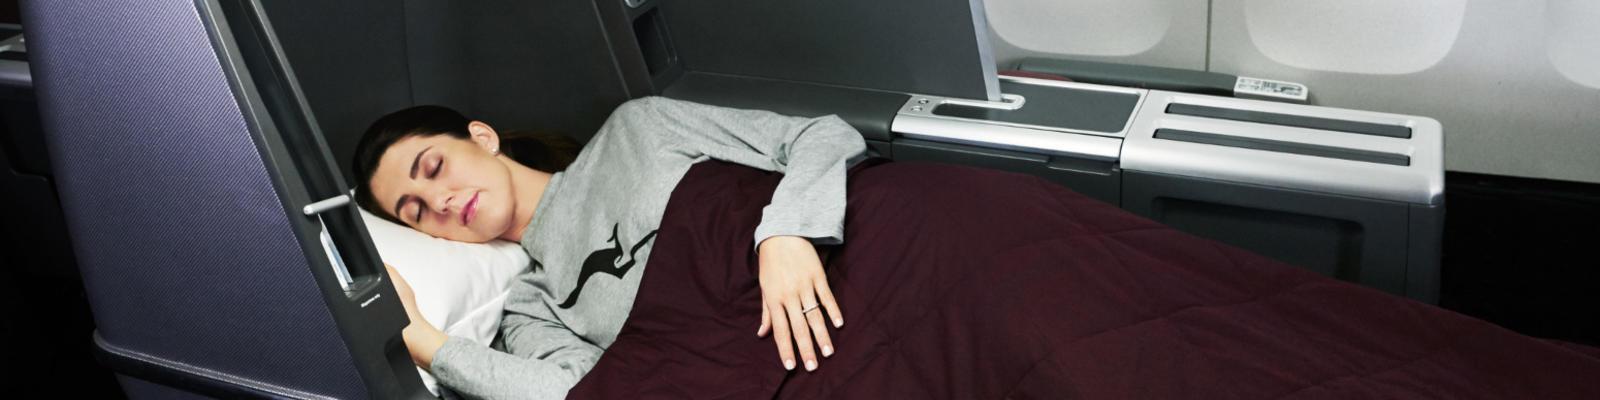 A woman sleeping on her Qantas Business Class lay flat seat